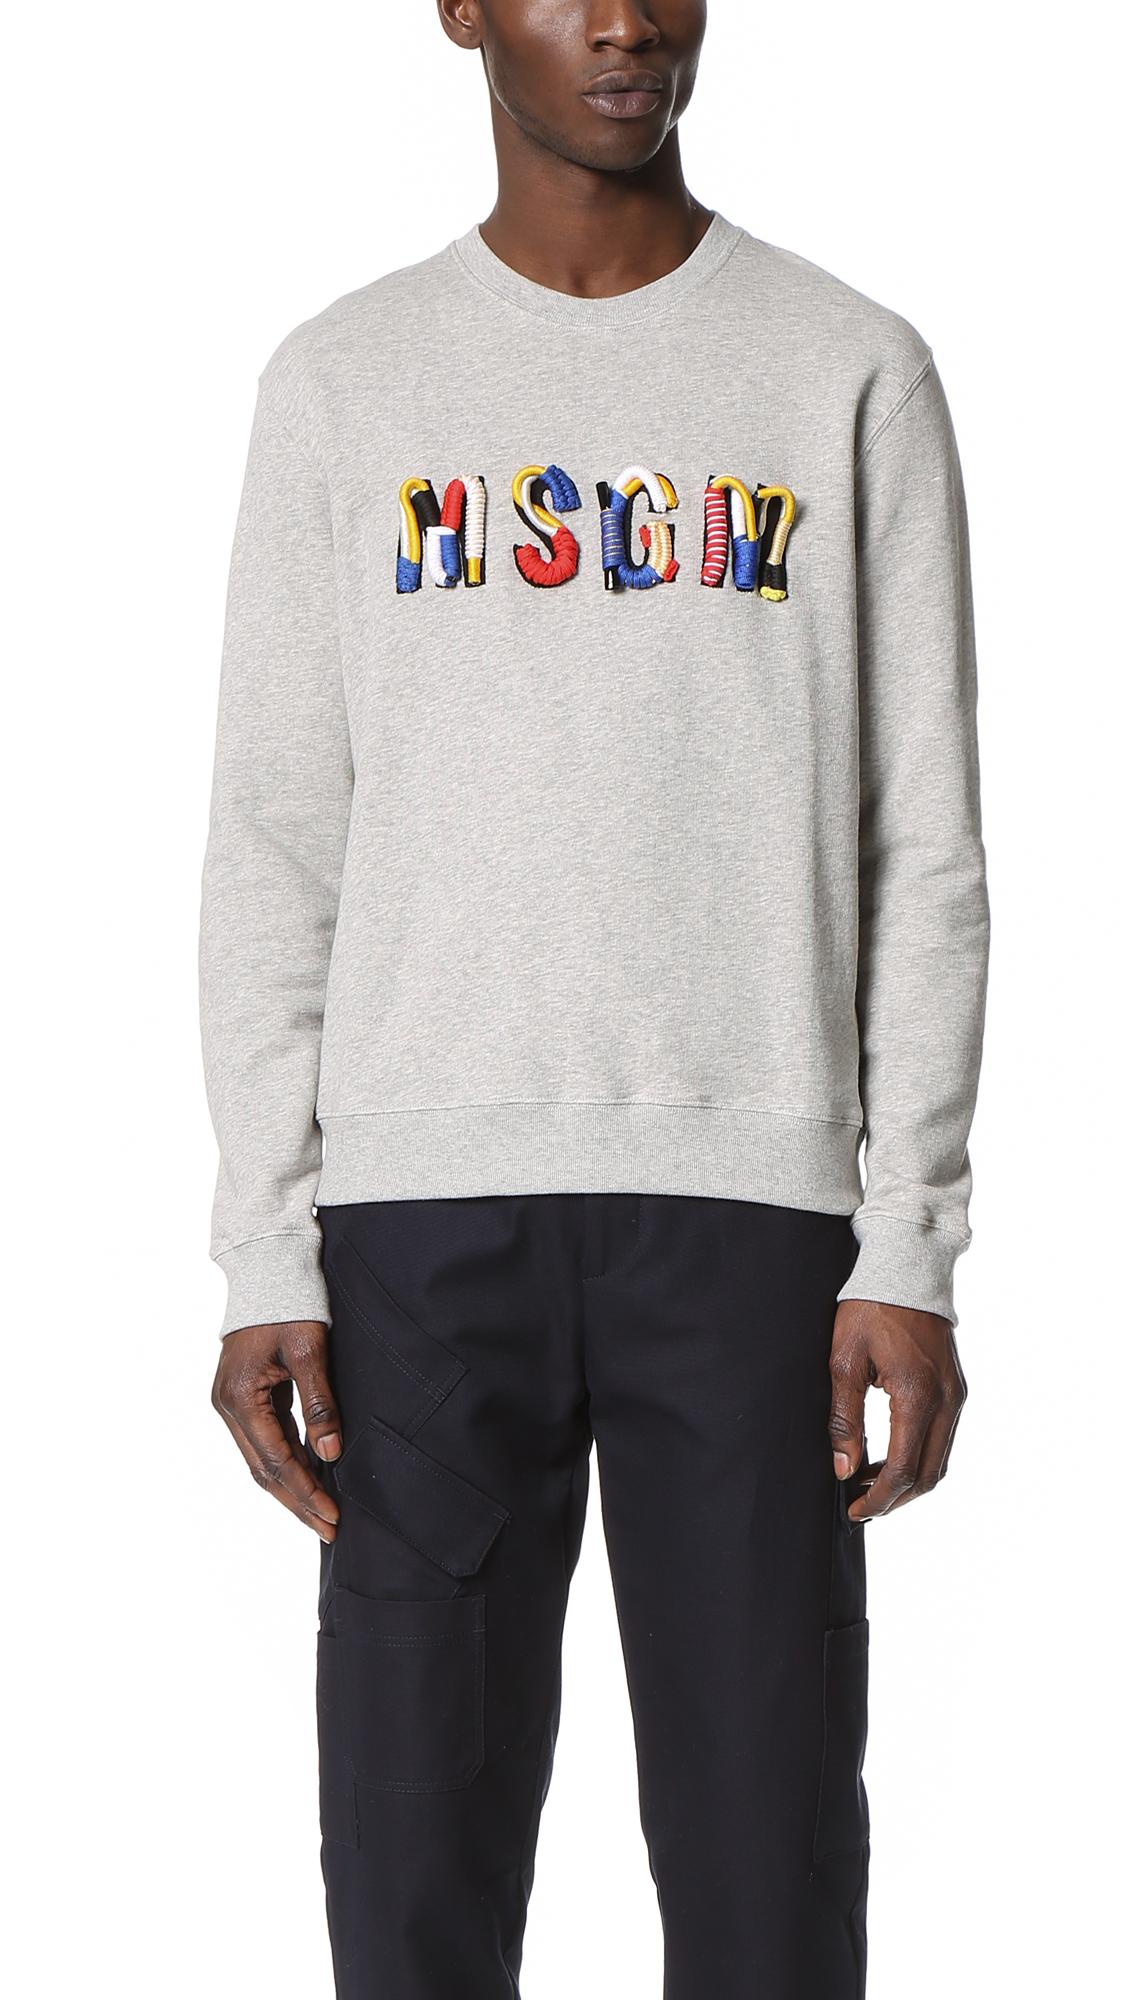 332c6231fd Lyst - MSGM Logo Crew Sweatshirt in Gray for Men